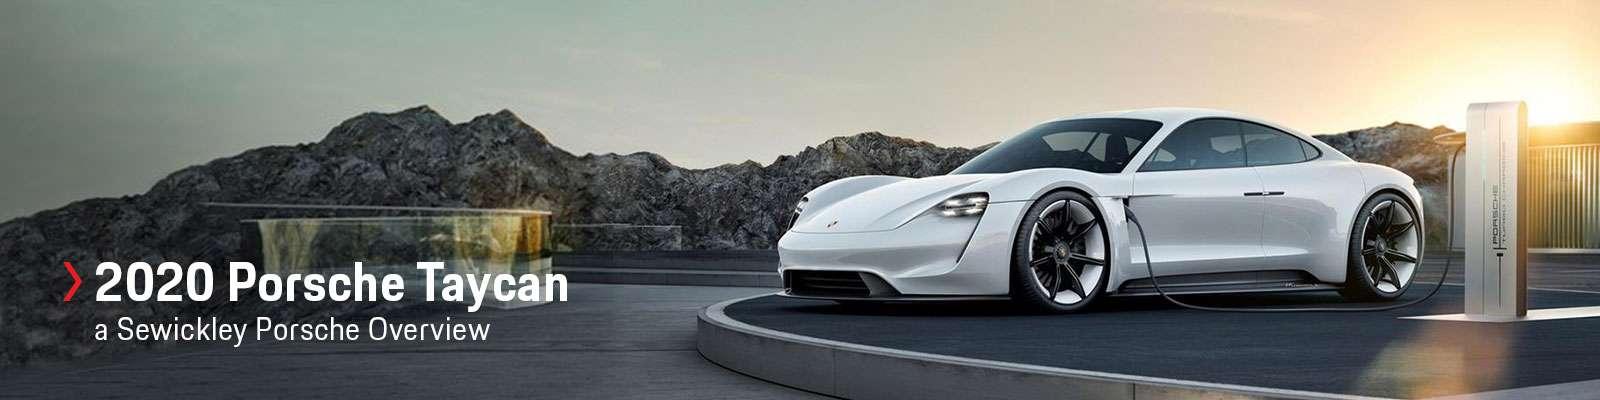 2020 Porsche Taycan Model Review